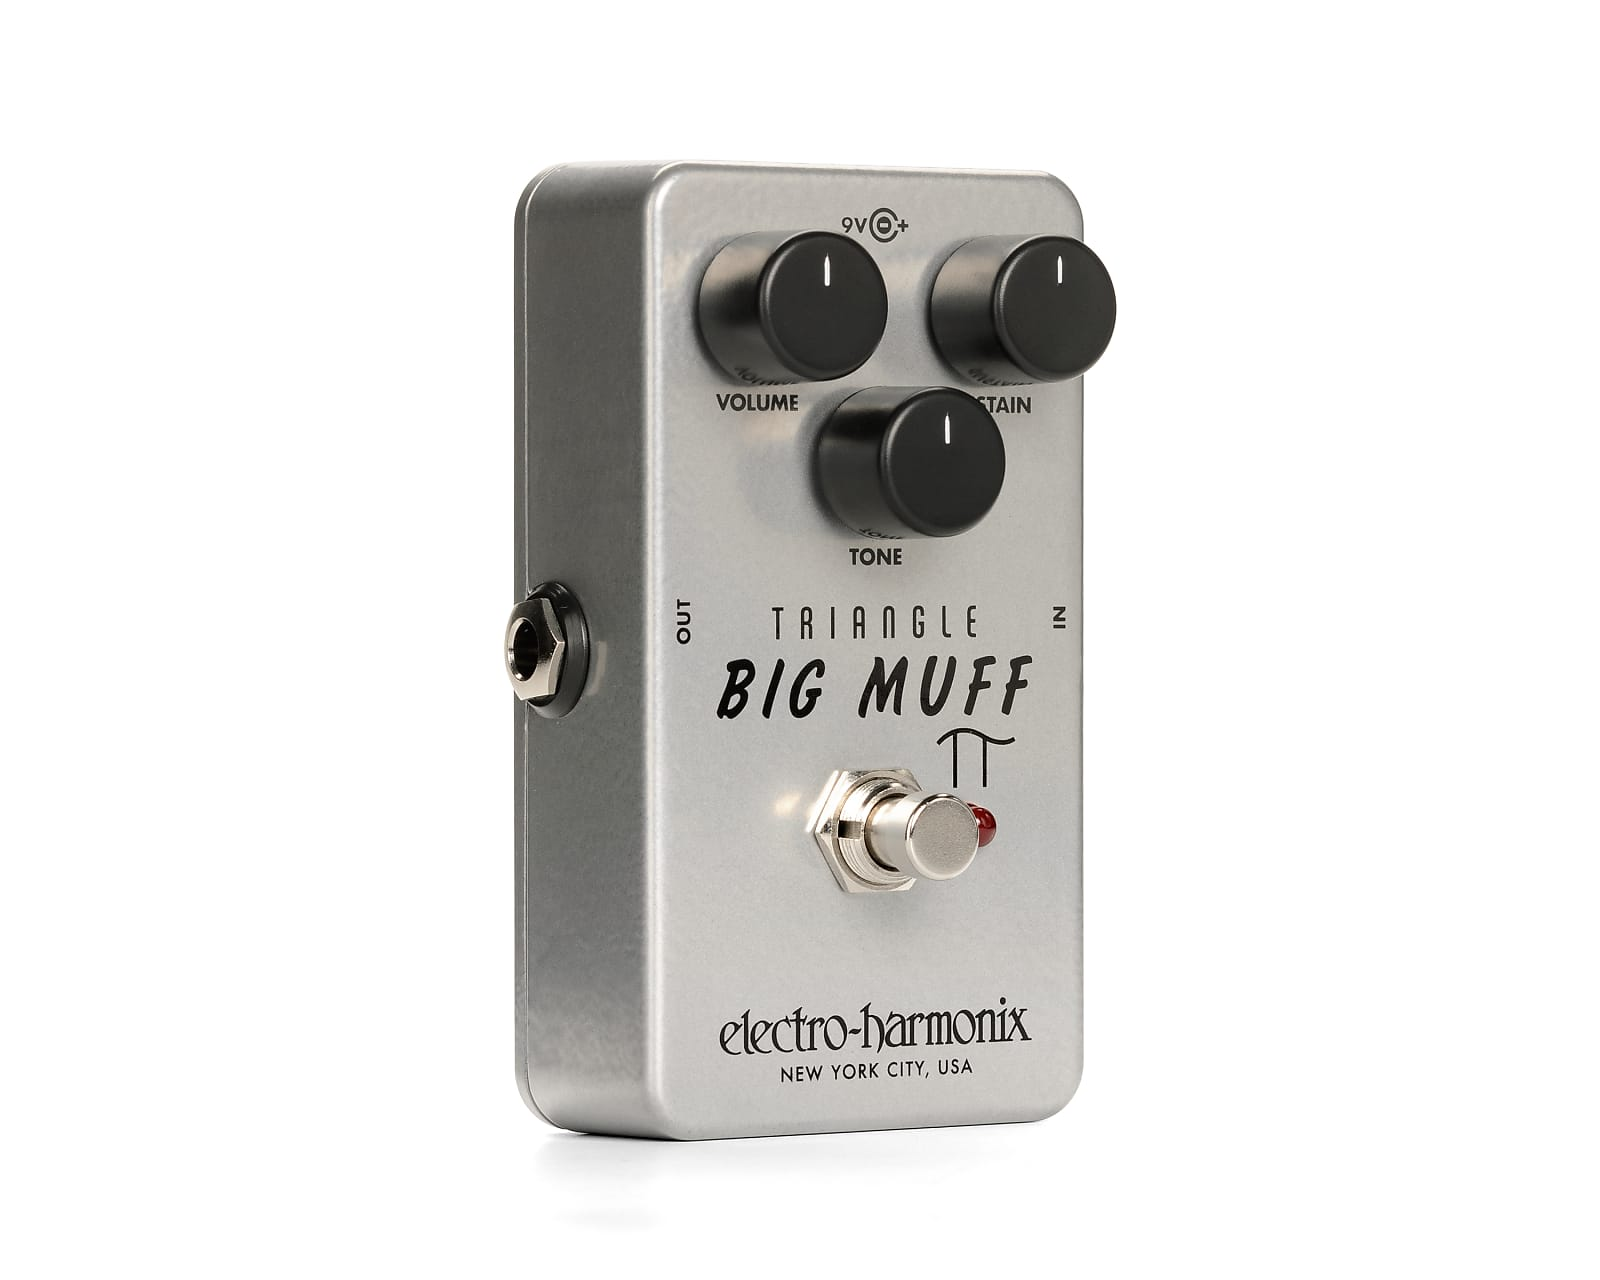 Electro-Harmonix EHX Triangle Big Muff Pi Fuzz / Distortion Effects Pedal